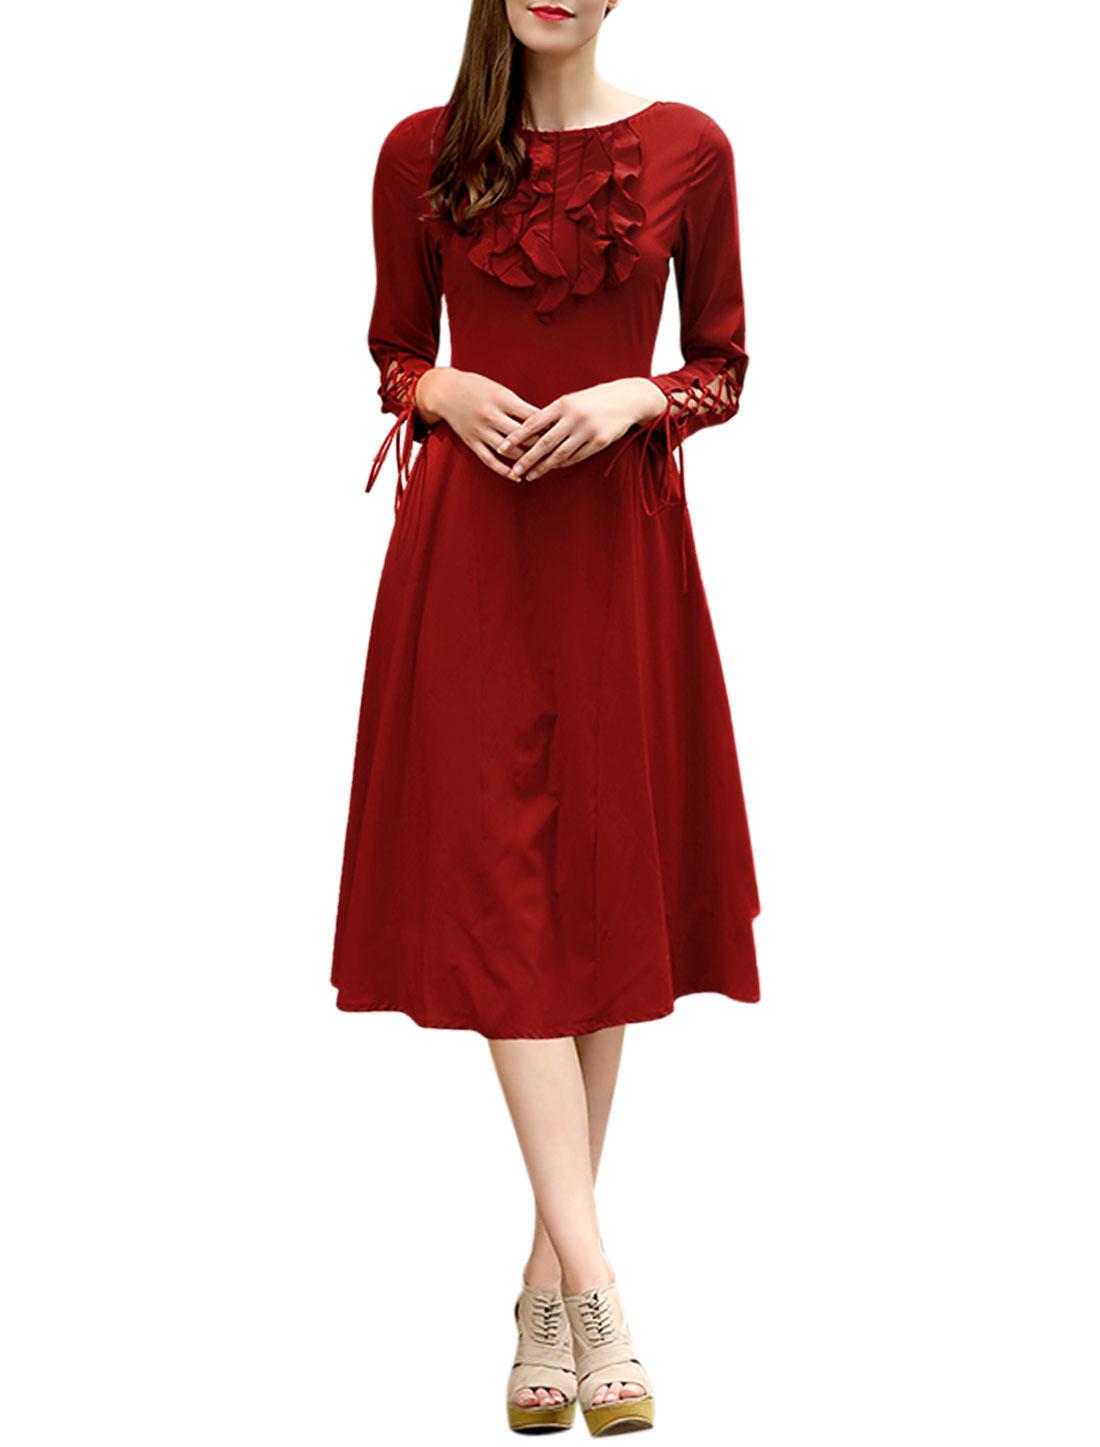 Women Bracelet Sleeves Drawstring Cuffs Ruffled Upper A Line Dress Red M